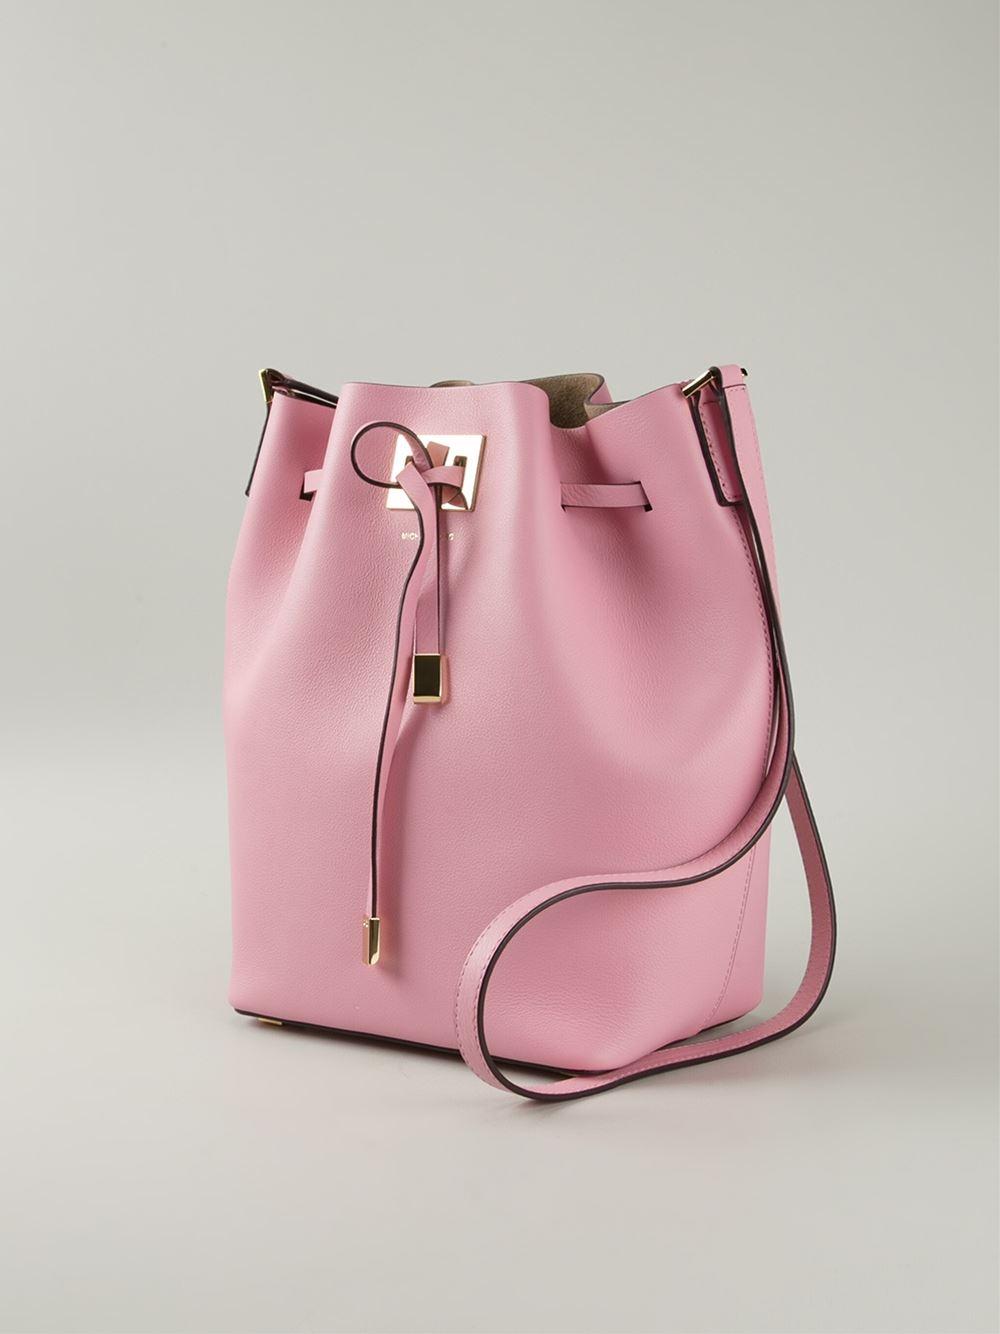 5adc2902ebfe67 Michael Kors 'Miranda' Bucket Bag in Pink - Lyst